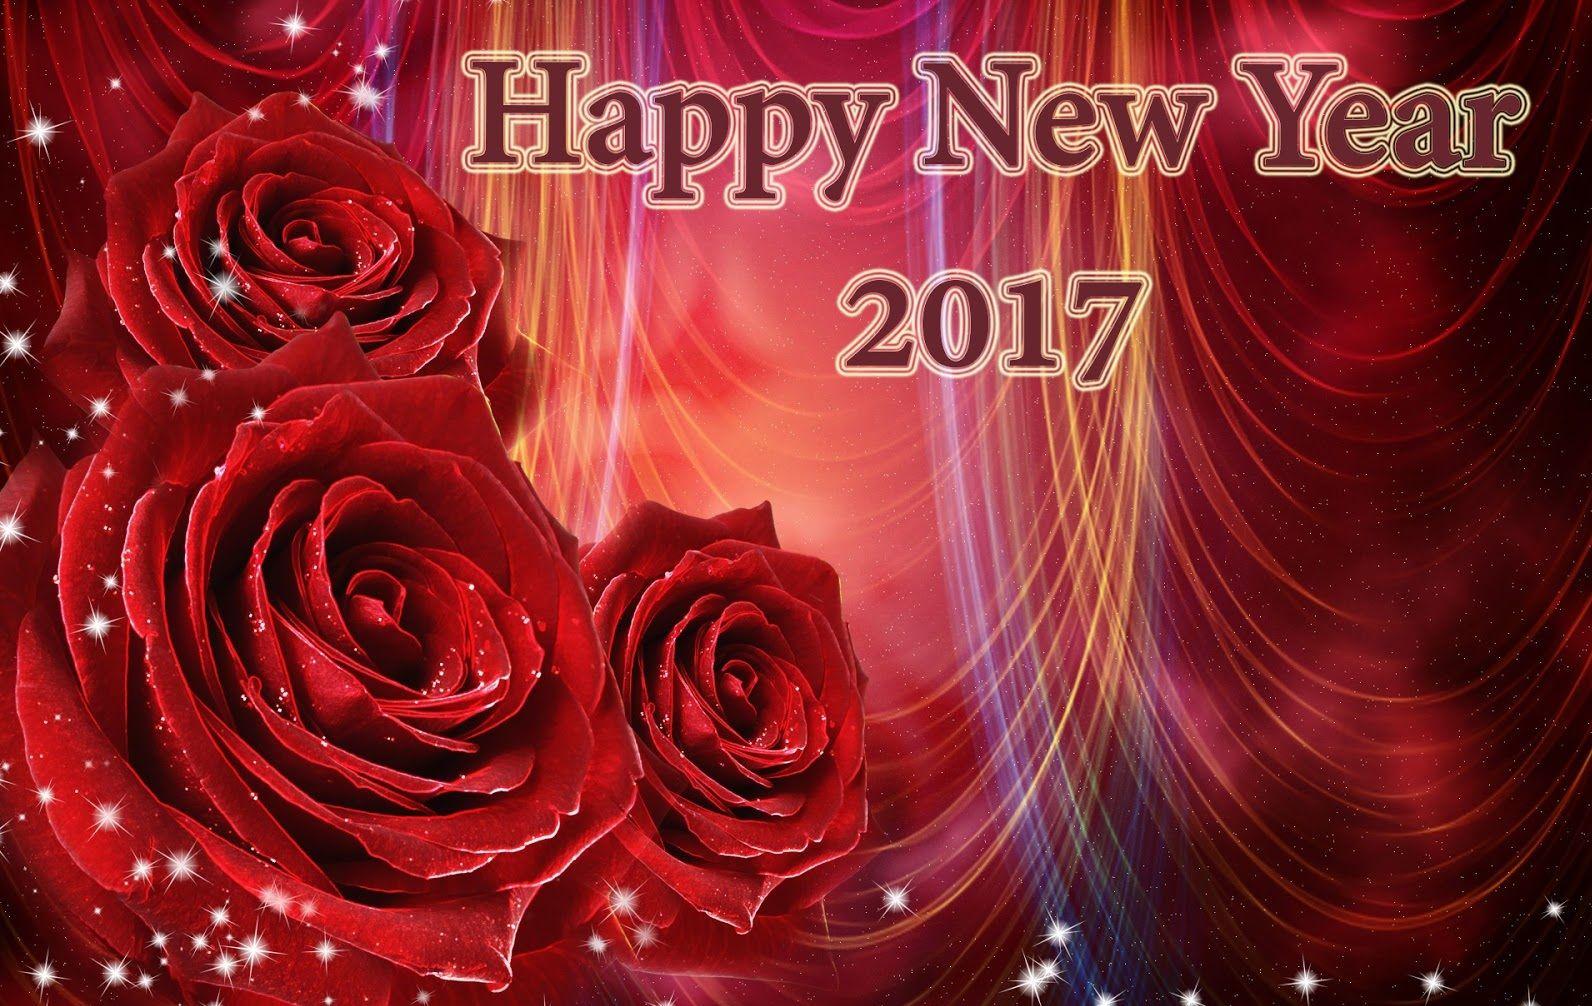 Wallpaper download 2017 - Happy New Year 2017 Wallpaper